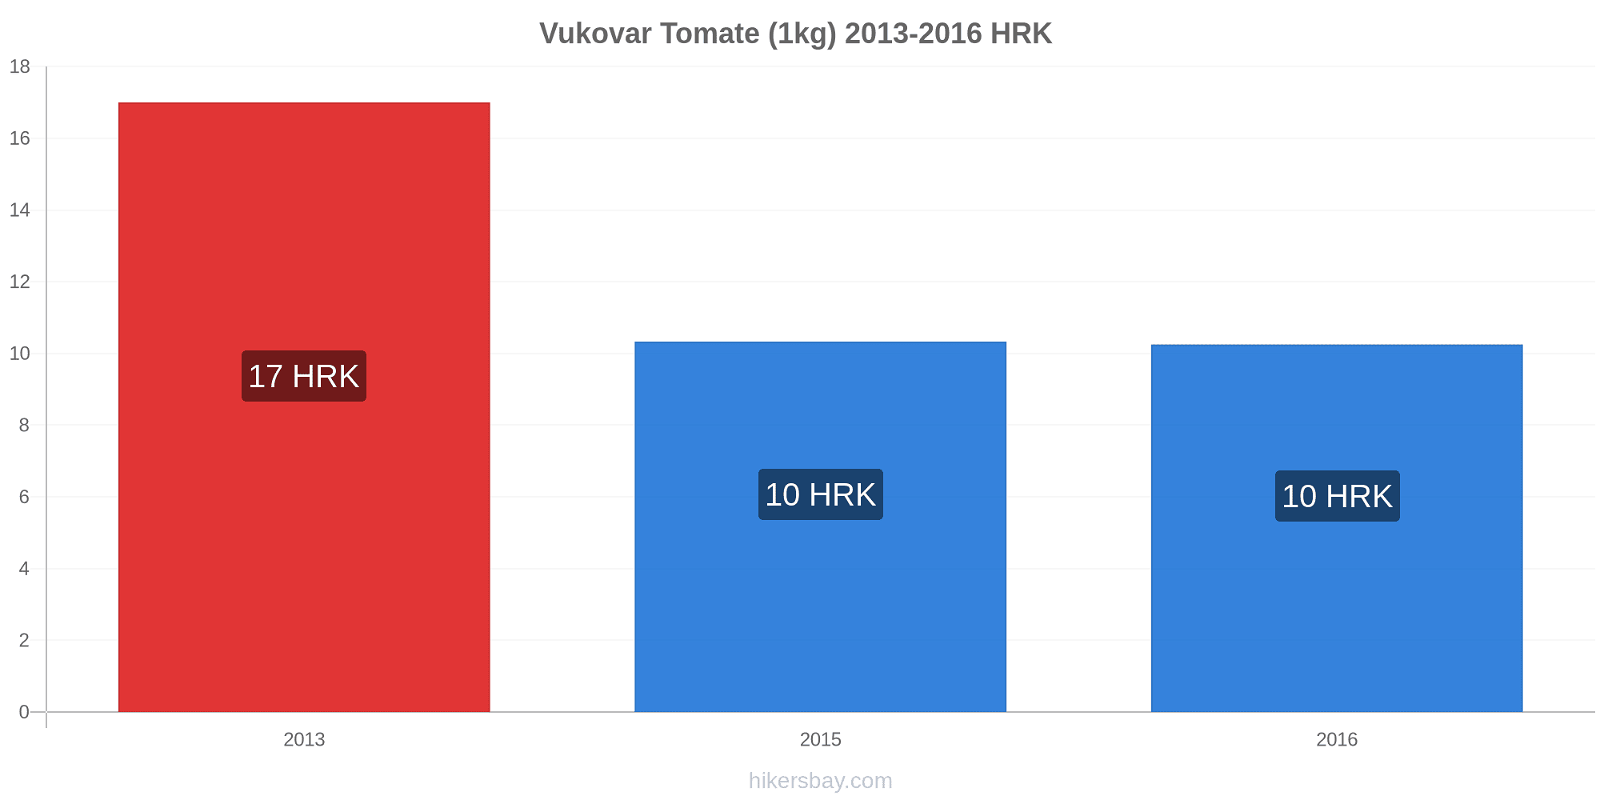 Vukovar changements de prix Tomate (1kg) hikersbay.com